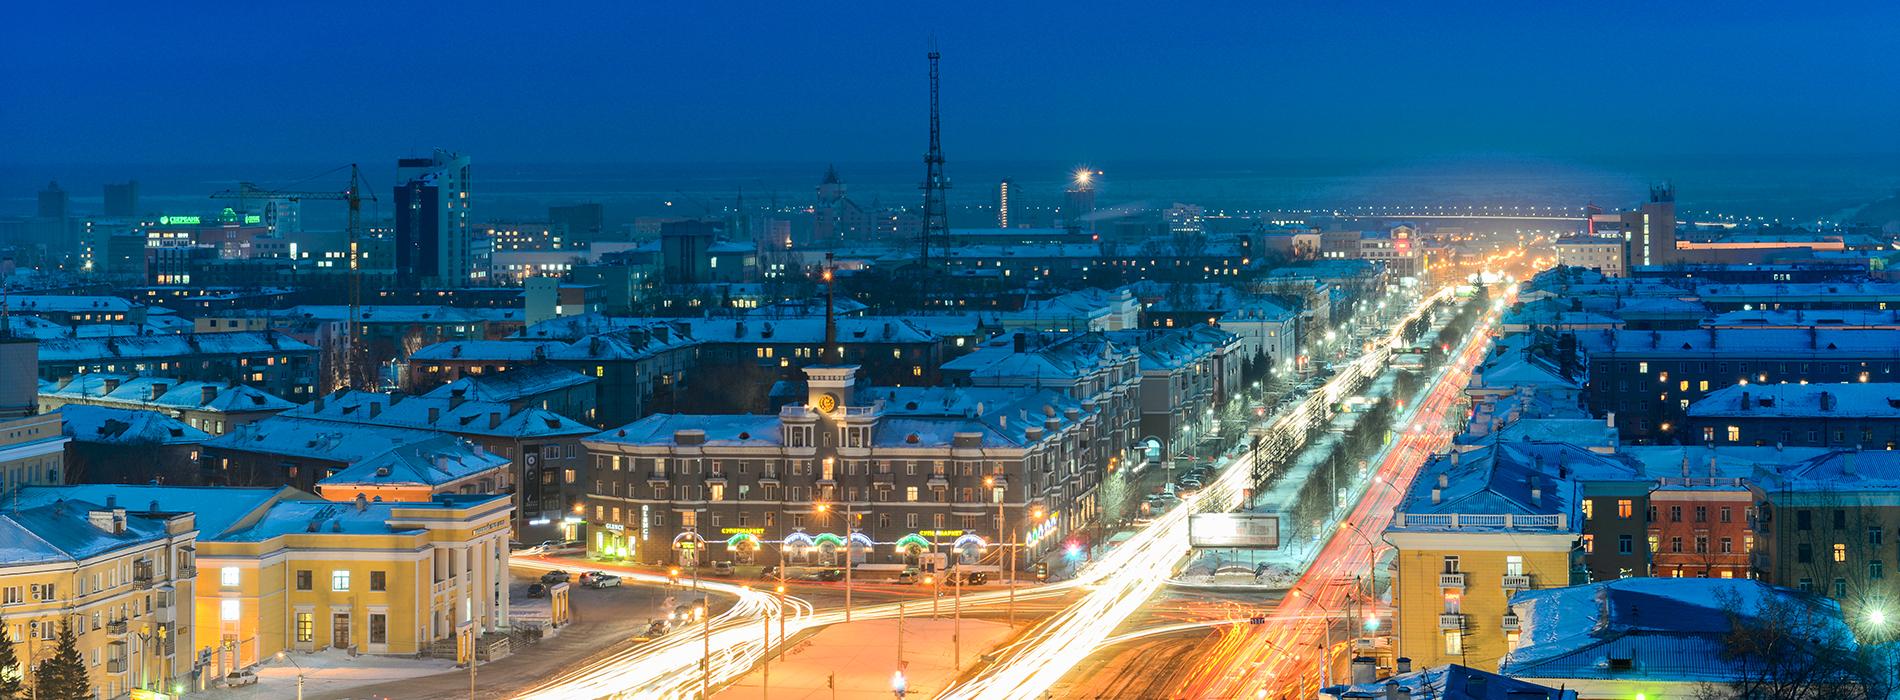 Авиабилеты Калининград — Барнаул, купить билеты на самолет туда и обратно